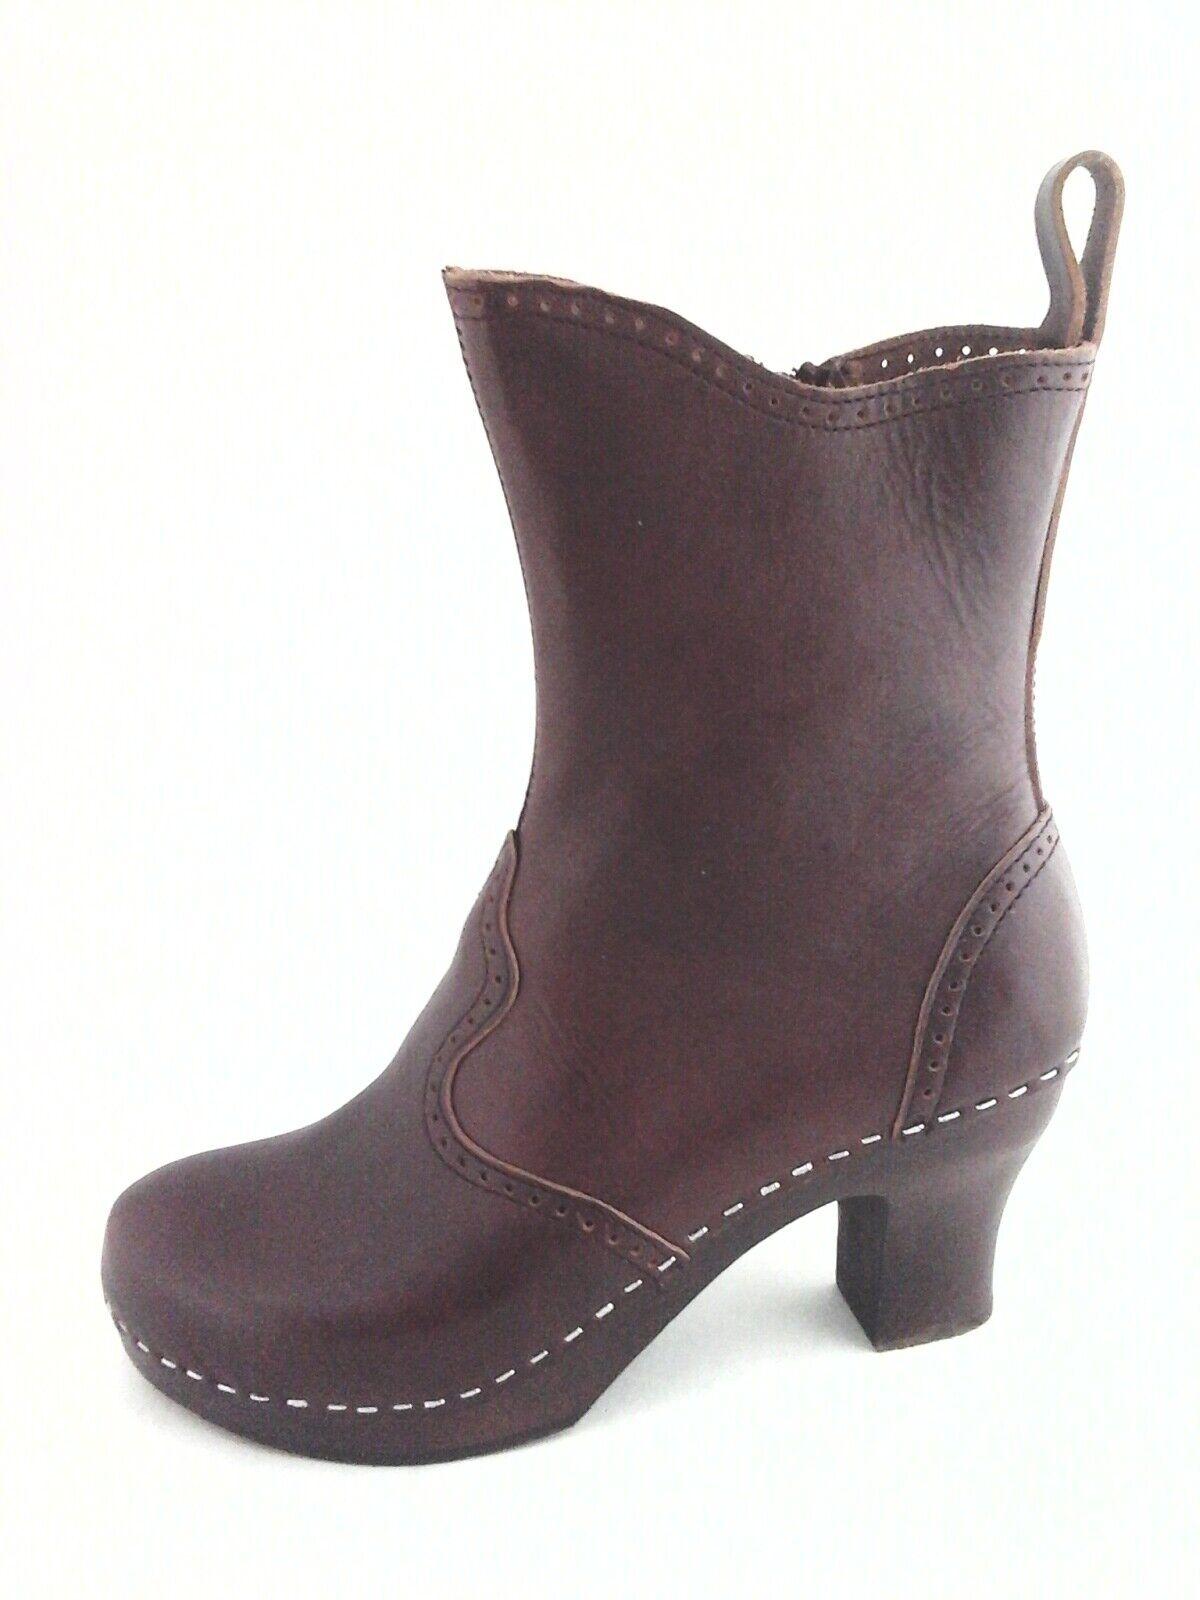 SWEDISH HASBEENS Clog Boots Cognac Brown Leather Wooden Heel Womens US 7 38  299